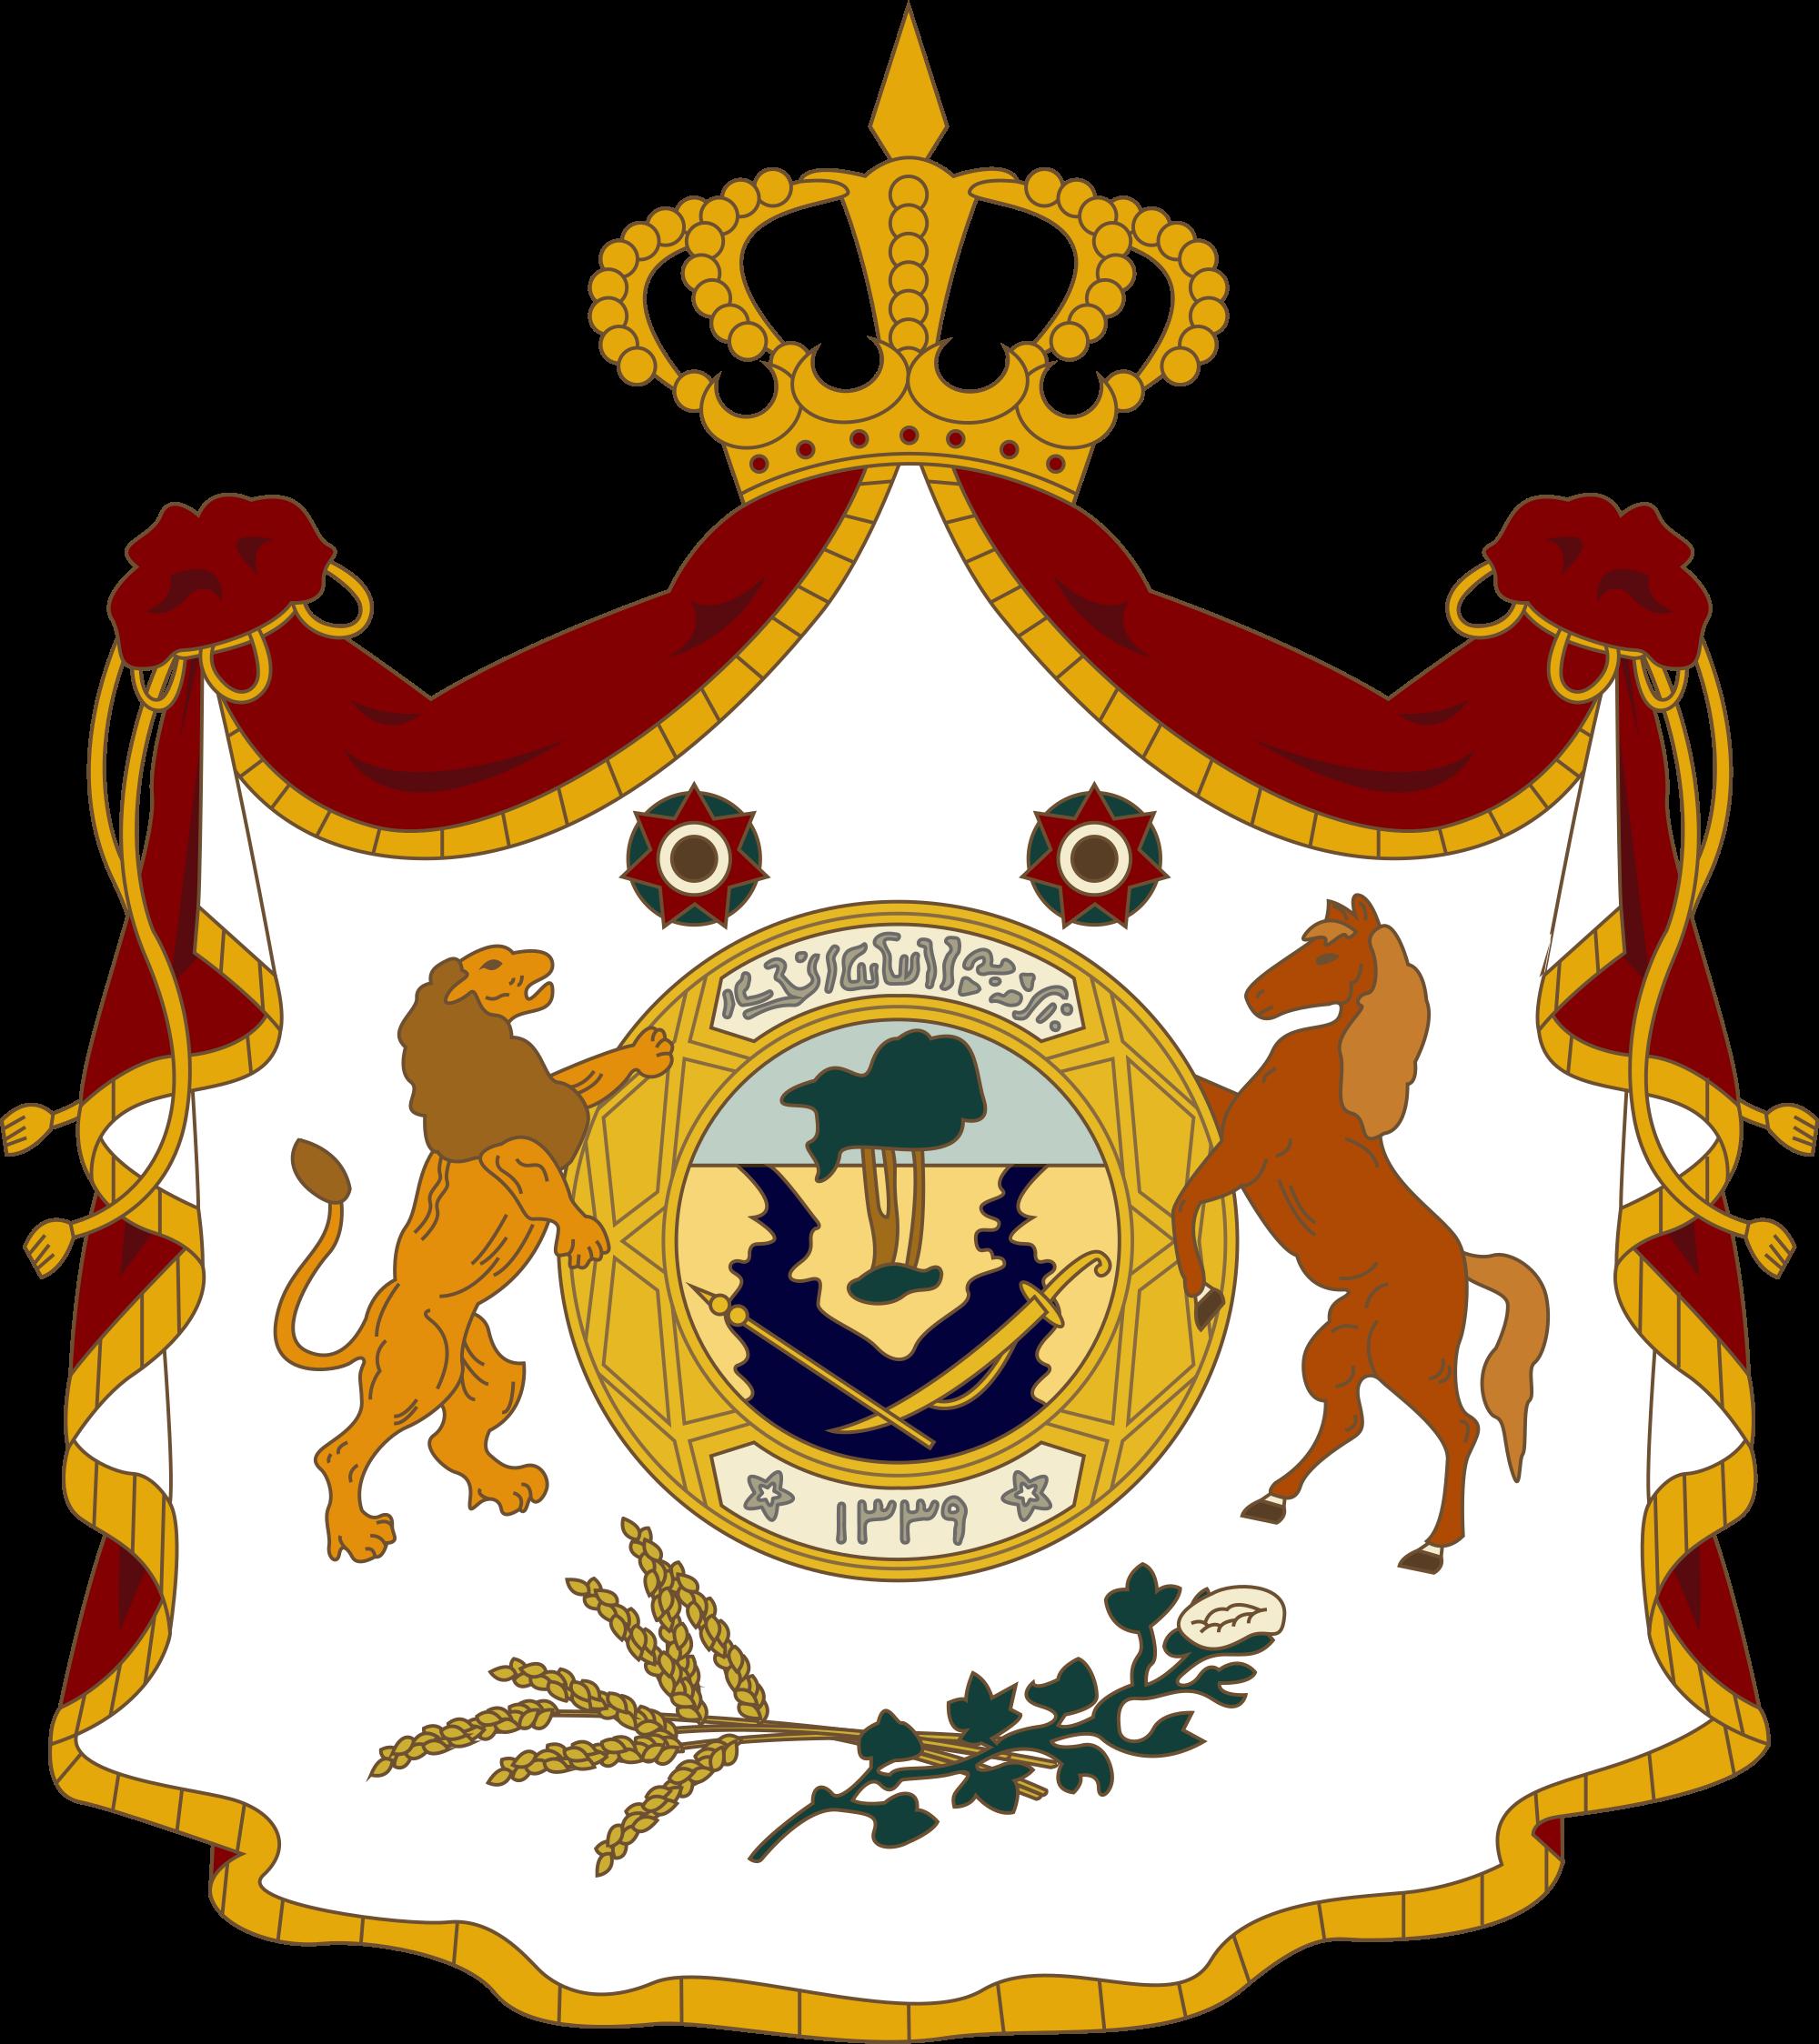 Anexo:Reyes de Iraq (MNI)